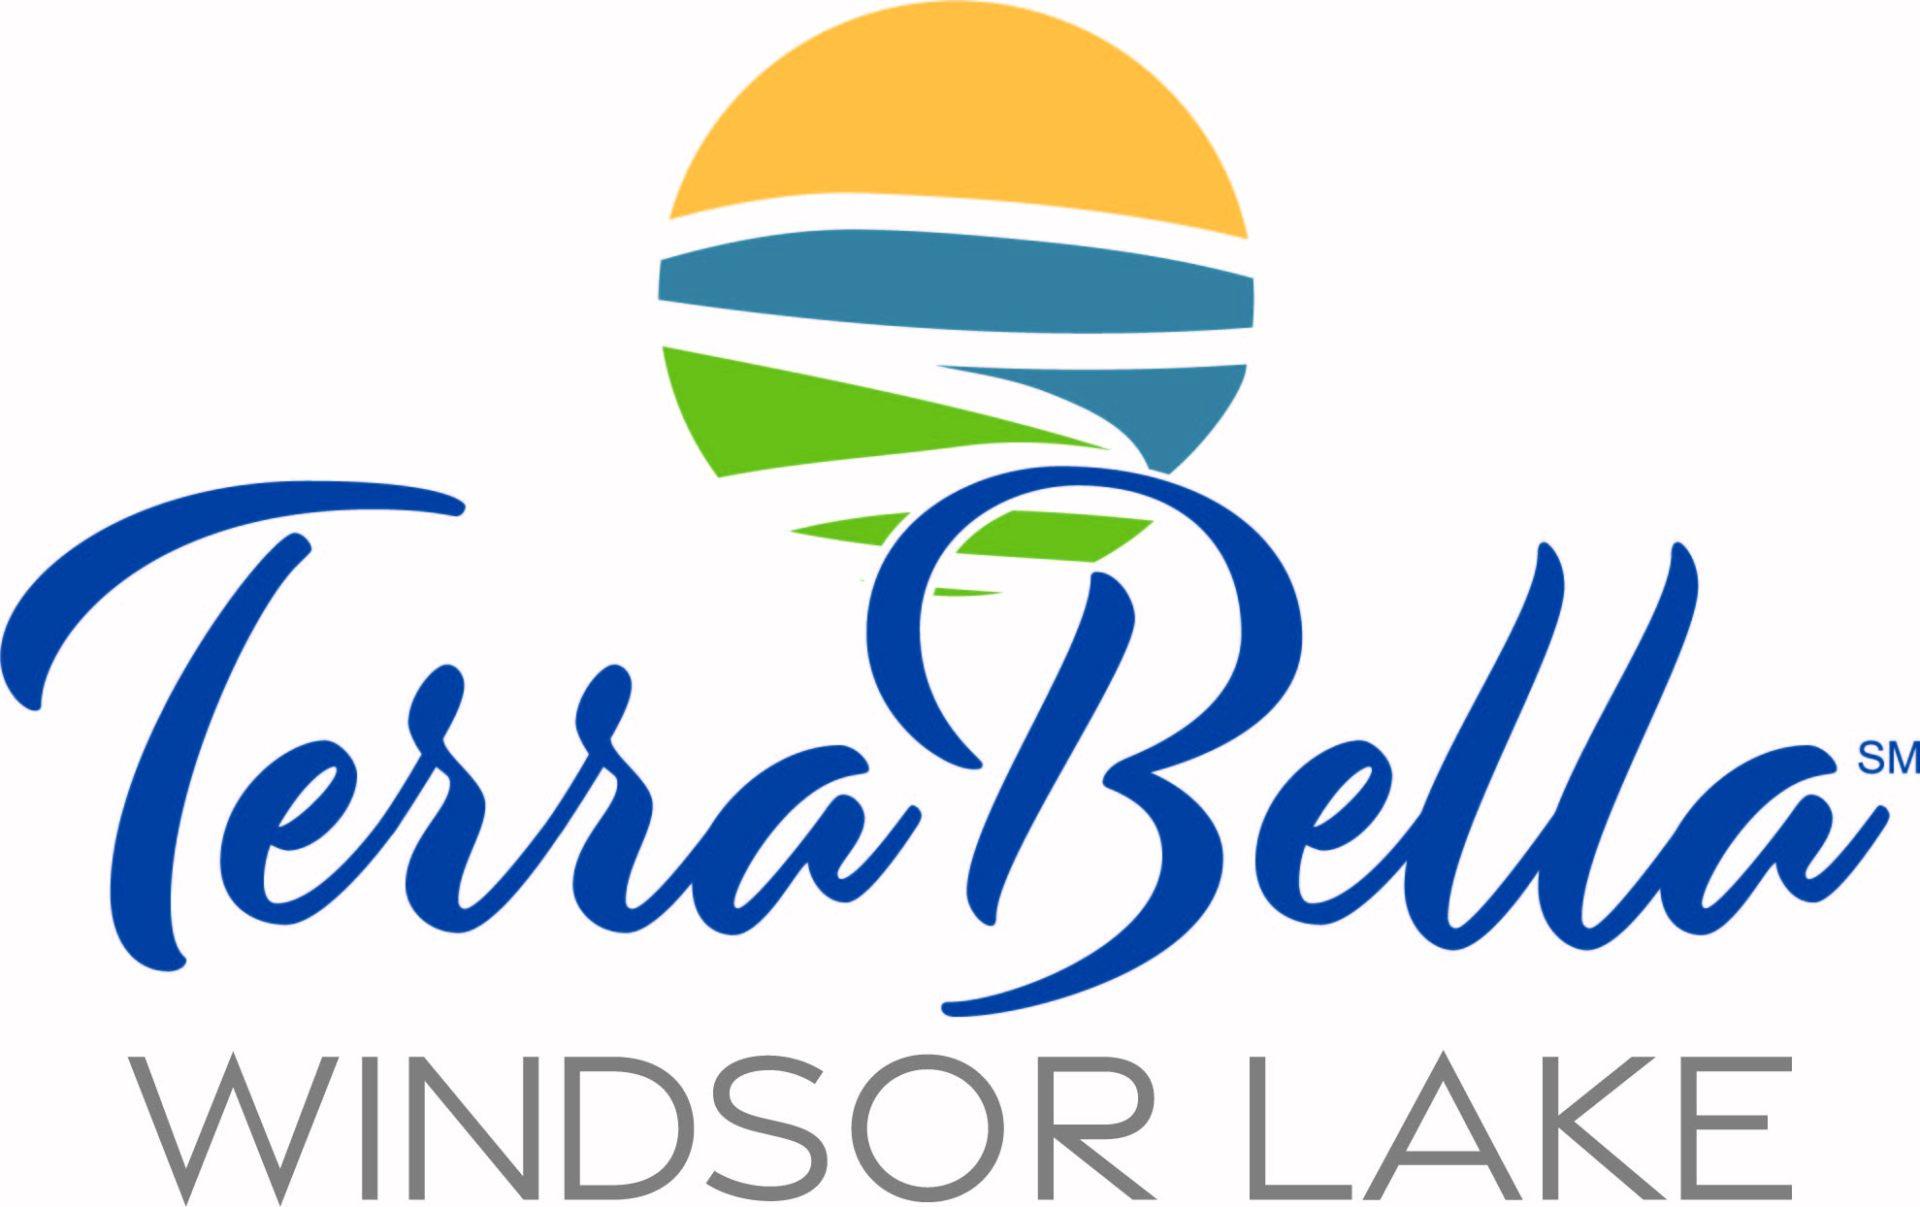 TerraBella Windsor Lakes